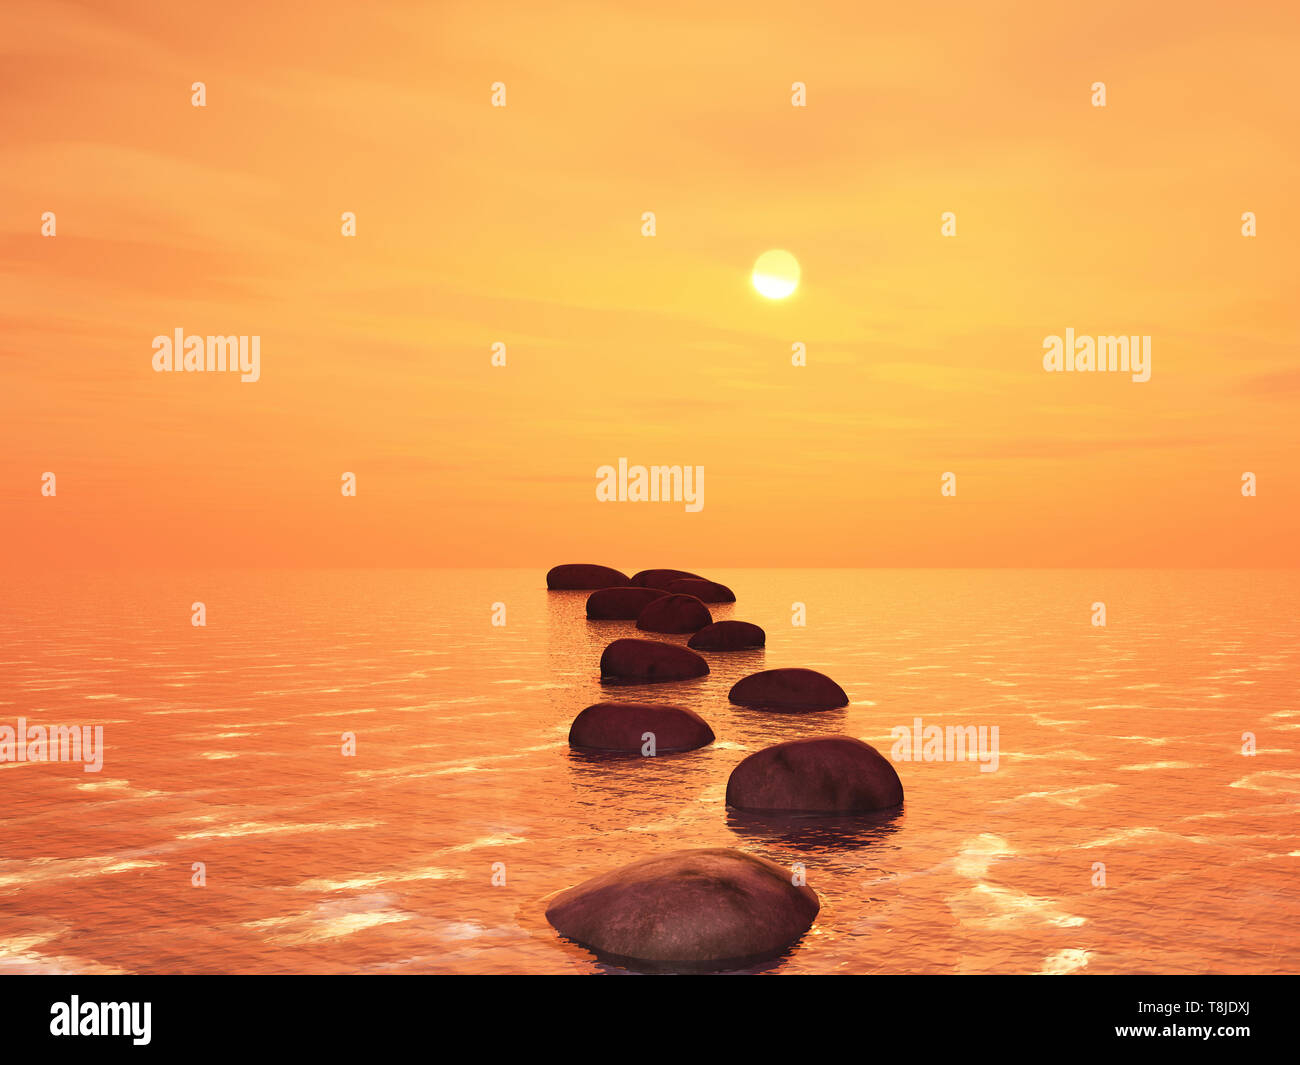 3D Render de Stepping Stones en un océano contra un atardecer cielo Foto de stock